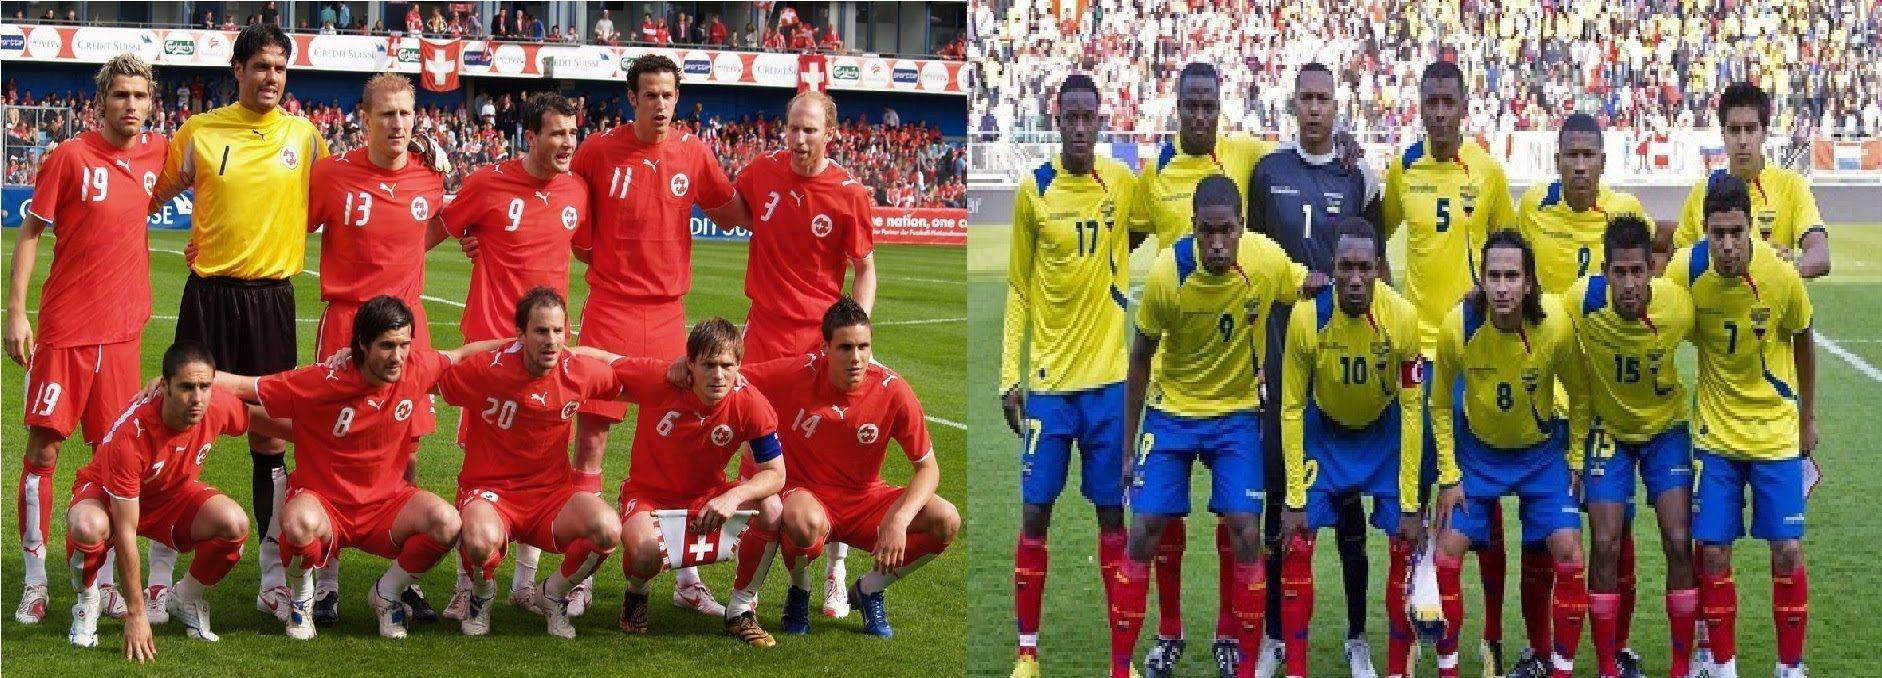 Switzerland Vs Ecuador Match FIFA World Cup 2014